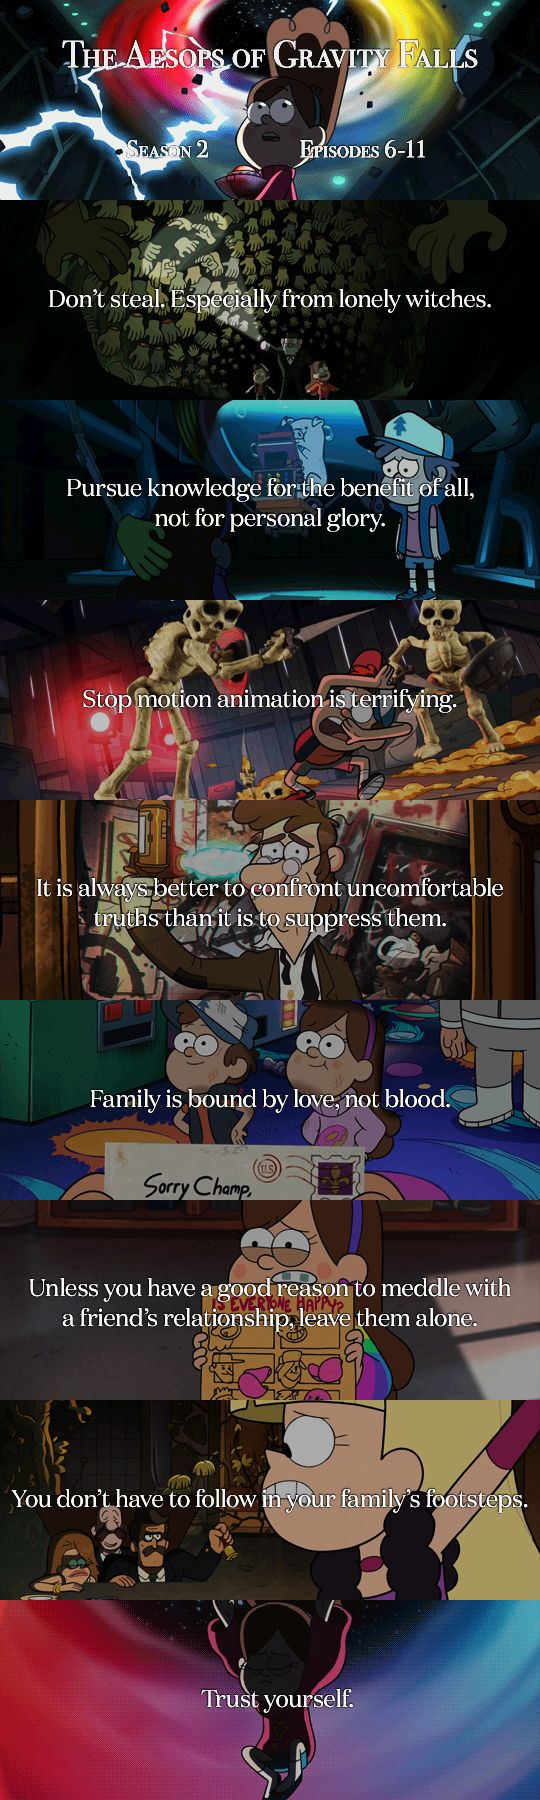 The Aesops of Gravity Falls - Season 2 Episodes 6-11